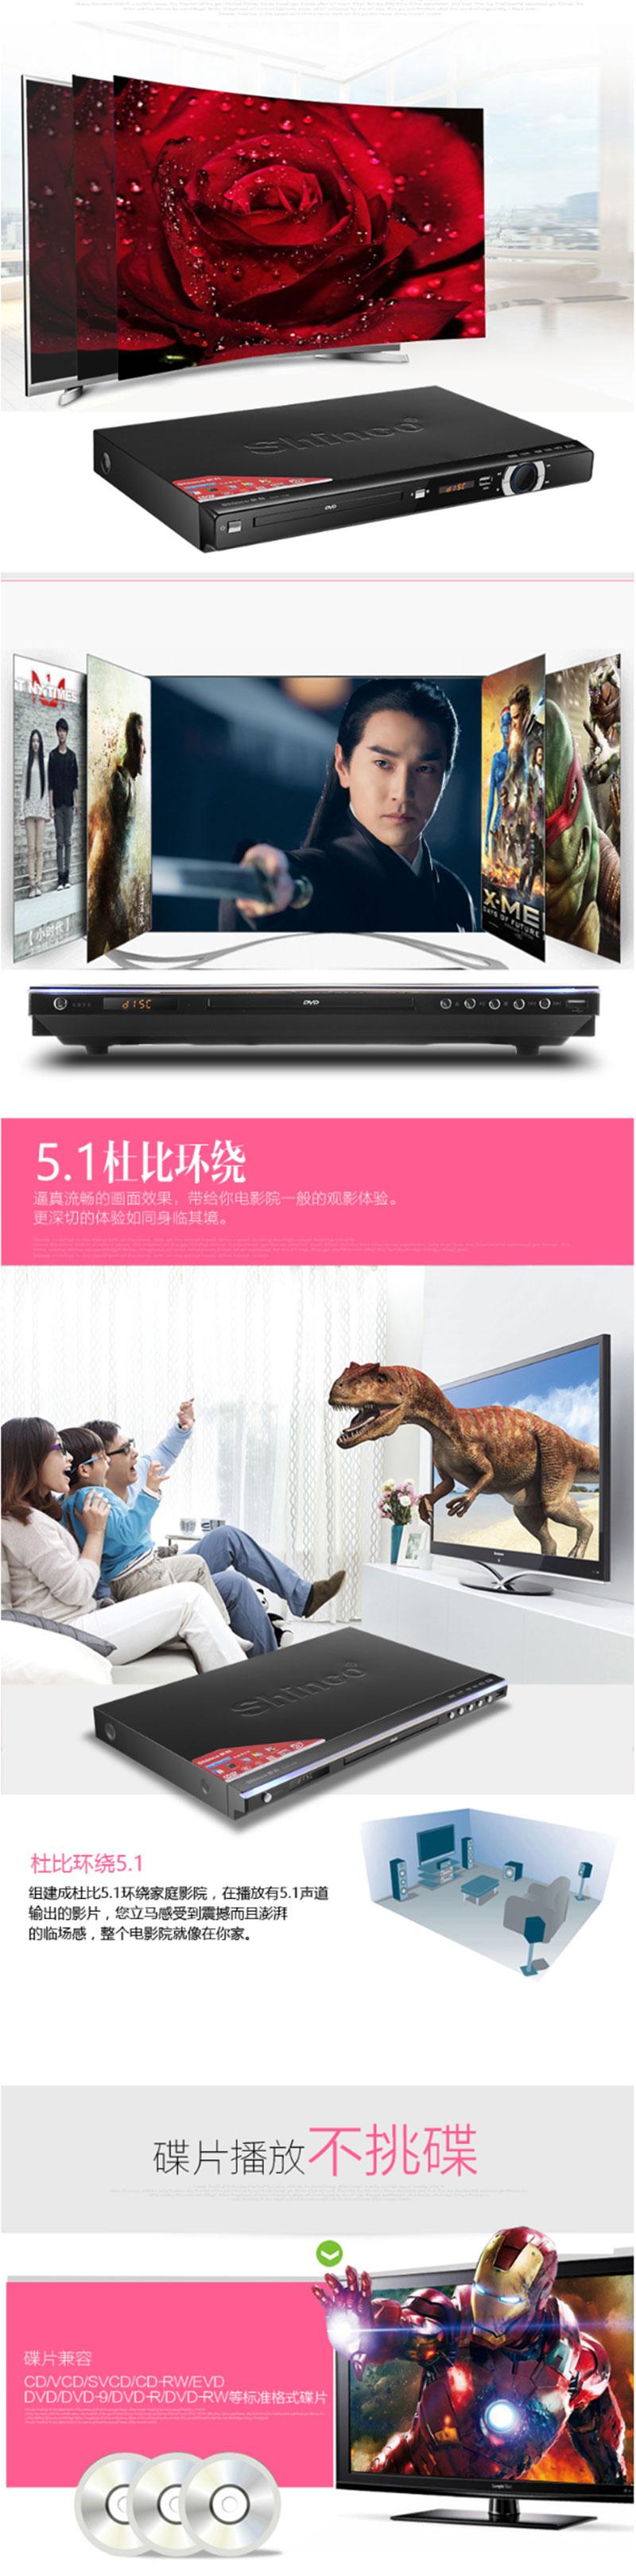 新科(Shinco)XK-107 VCD播放机影碟机